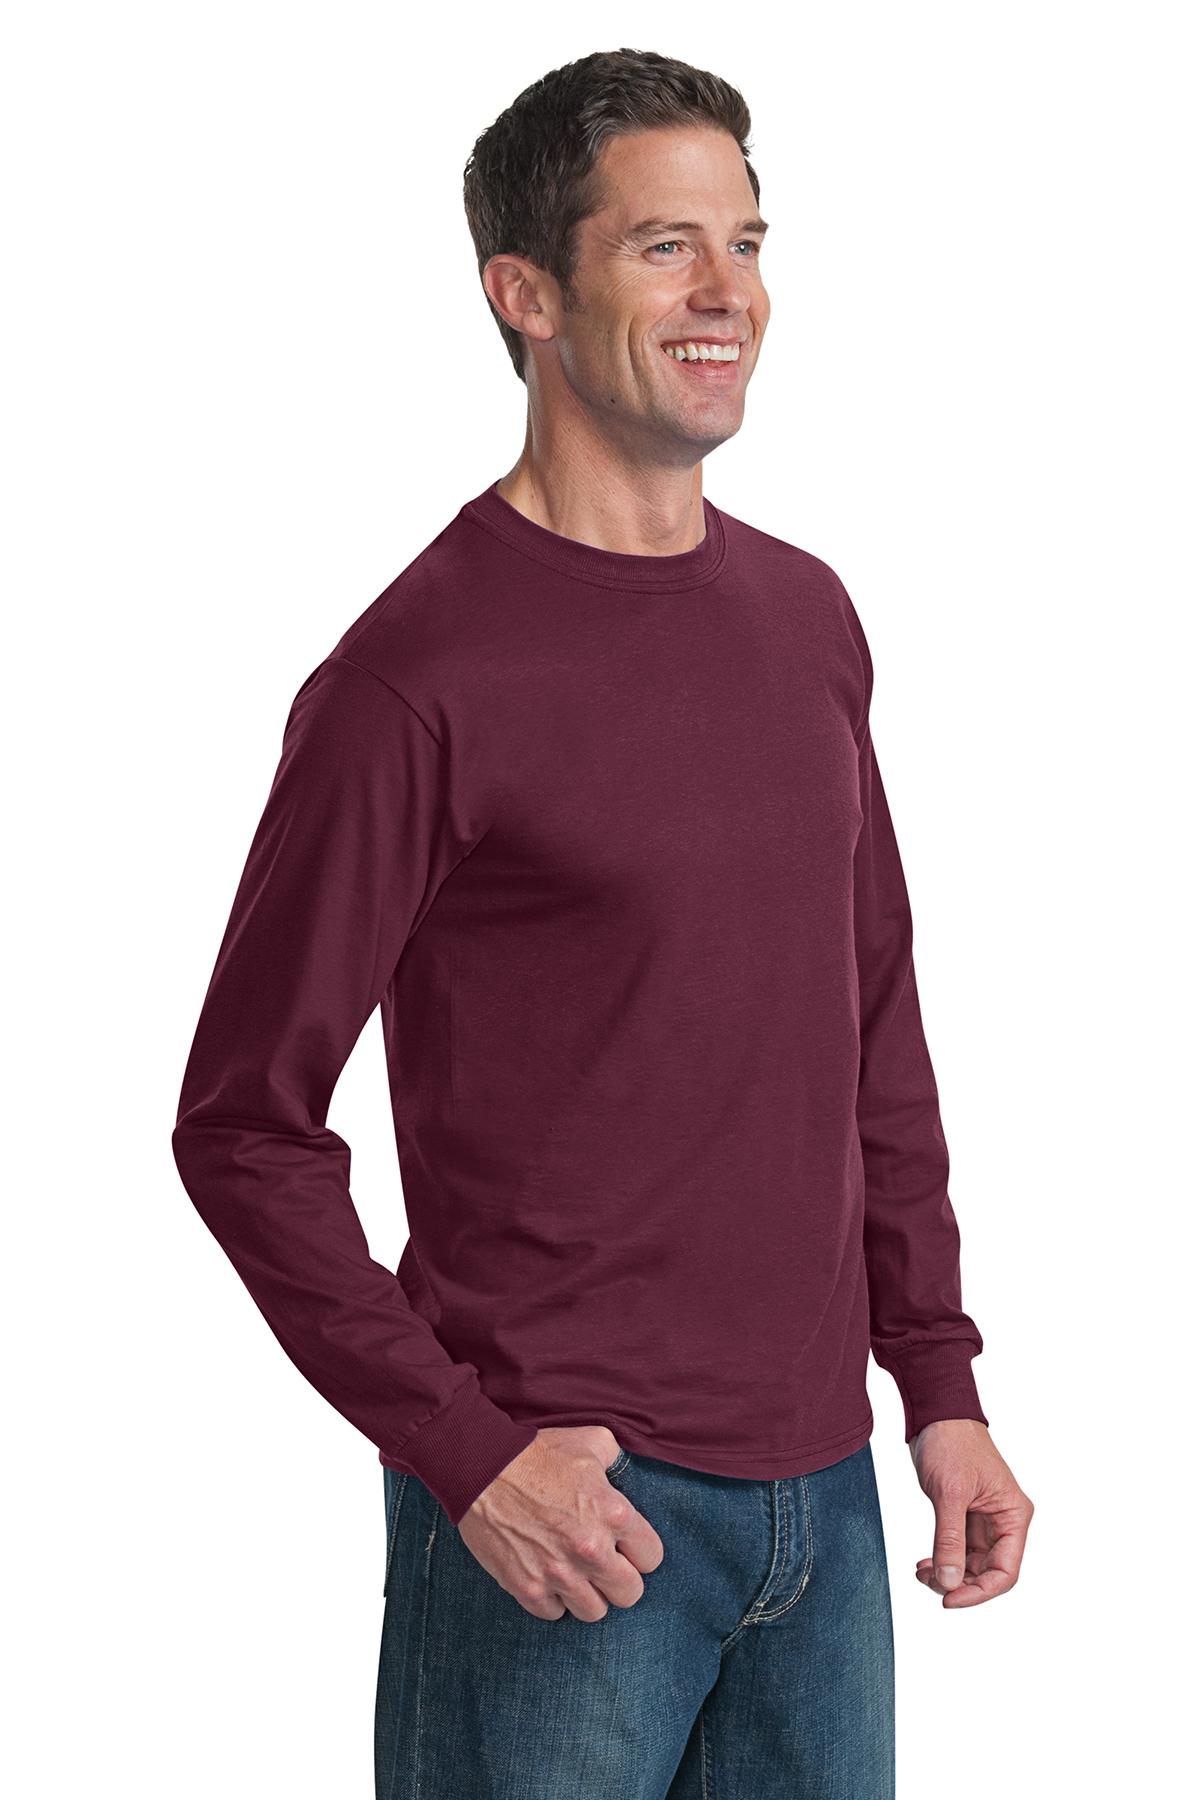 5335903d15150c Fruit of the Loom® HD Cotton™ 100% Cotton Long Sleeve T-Shirt ...